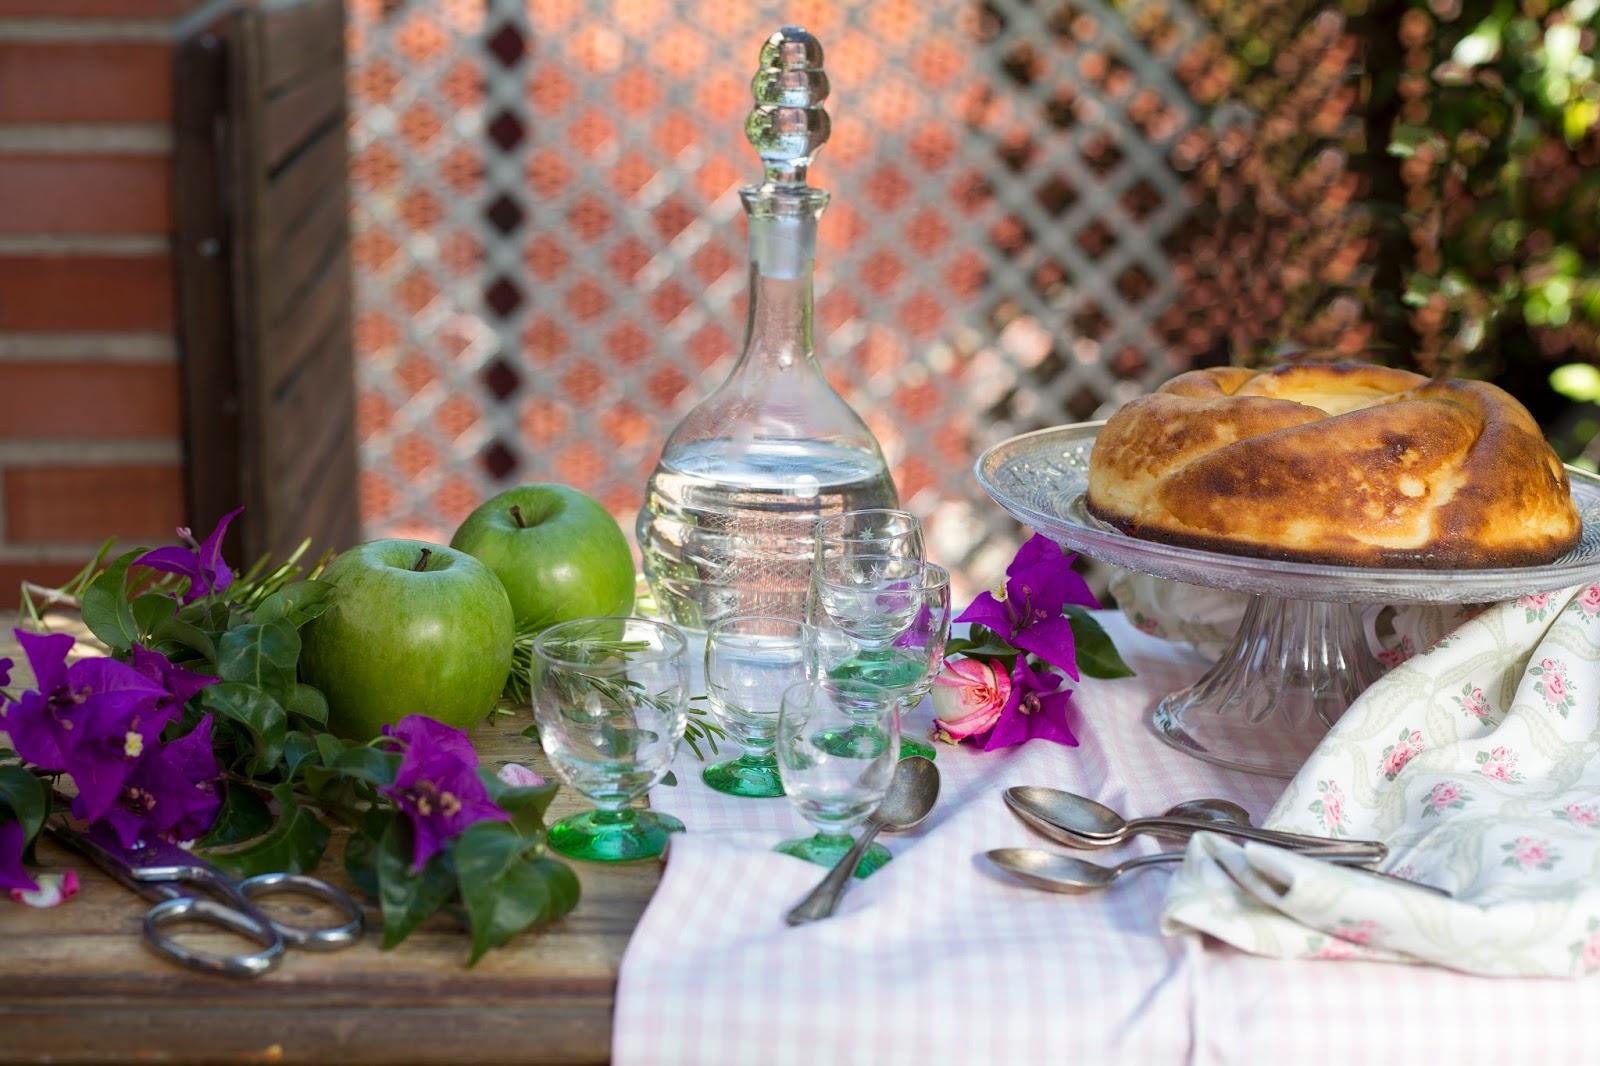 Tarta de requesón en pedestal de cristal con manzanas verdes licorera antigua con flores verdes y púrpura